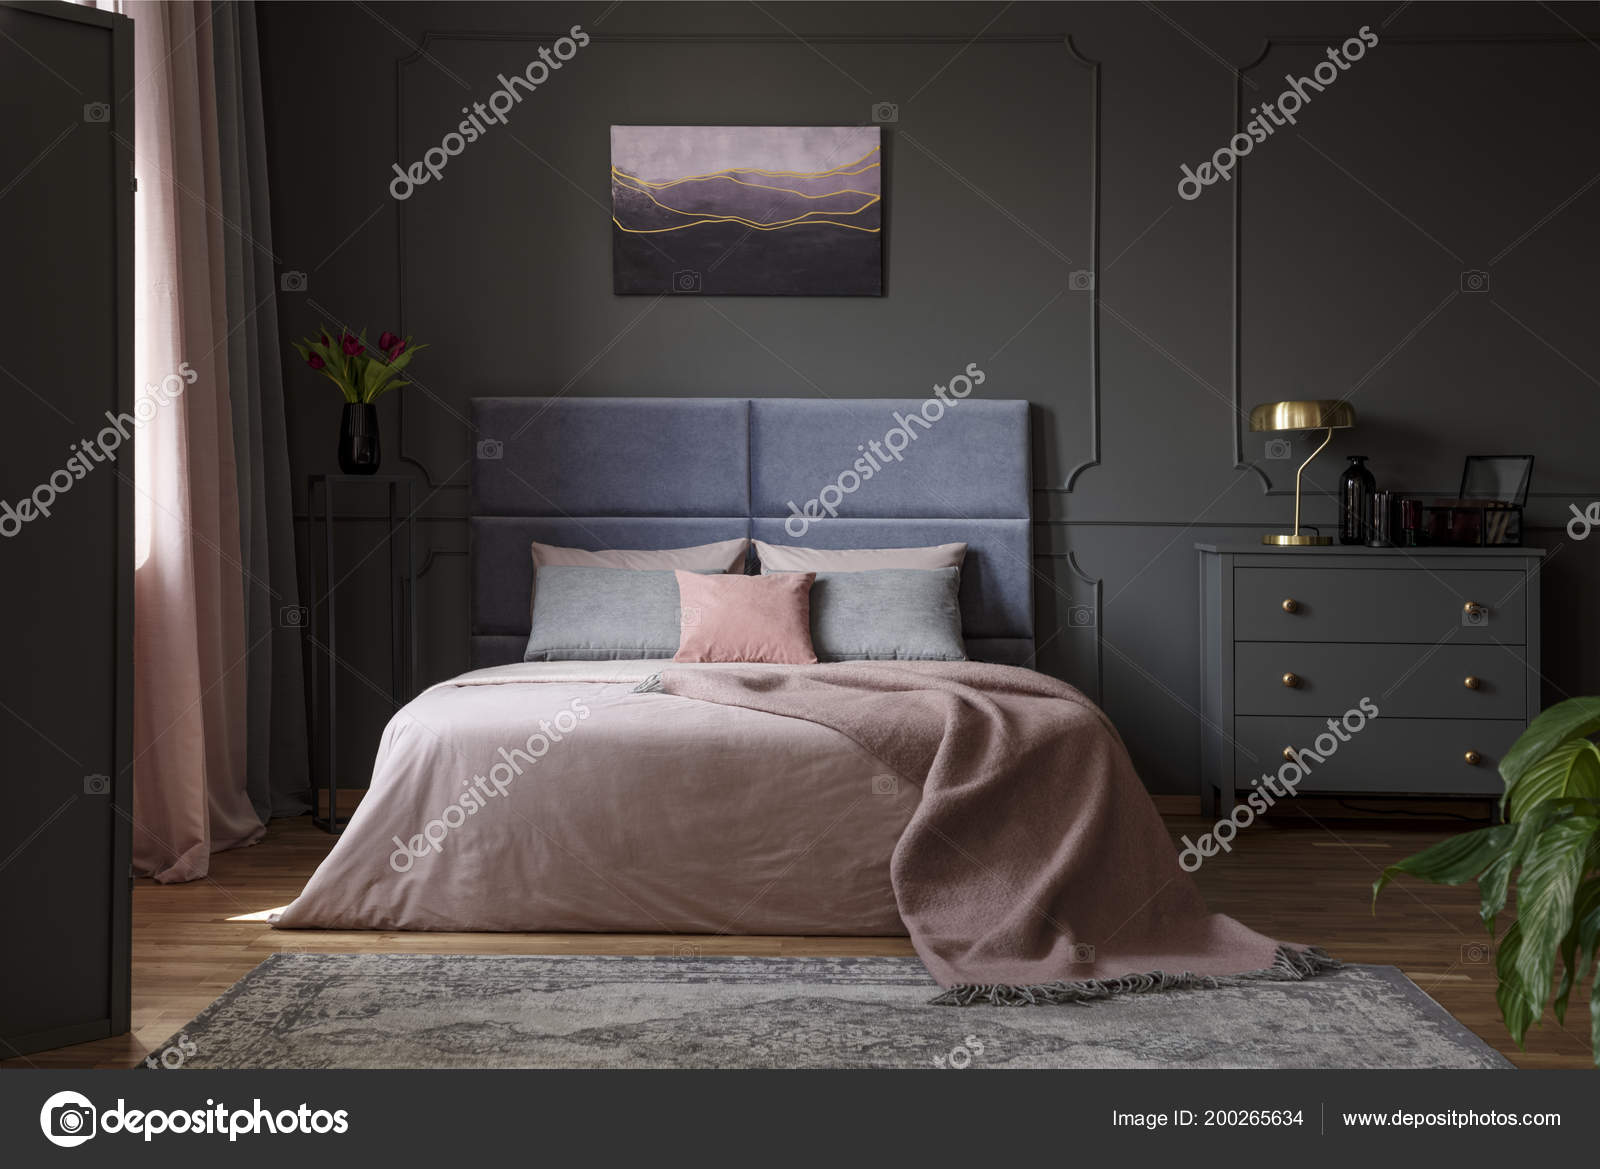 Pastel Blanket Bed Pink Blue Bedroom Interior Gold Lamp Grey Stock Photo